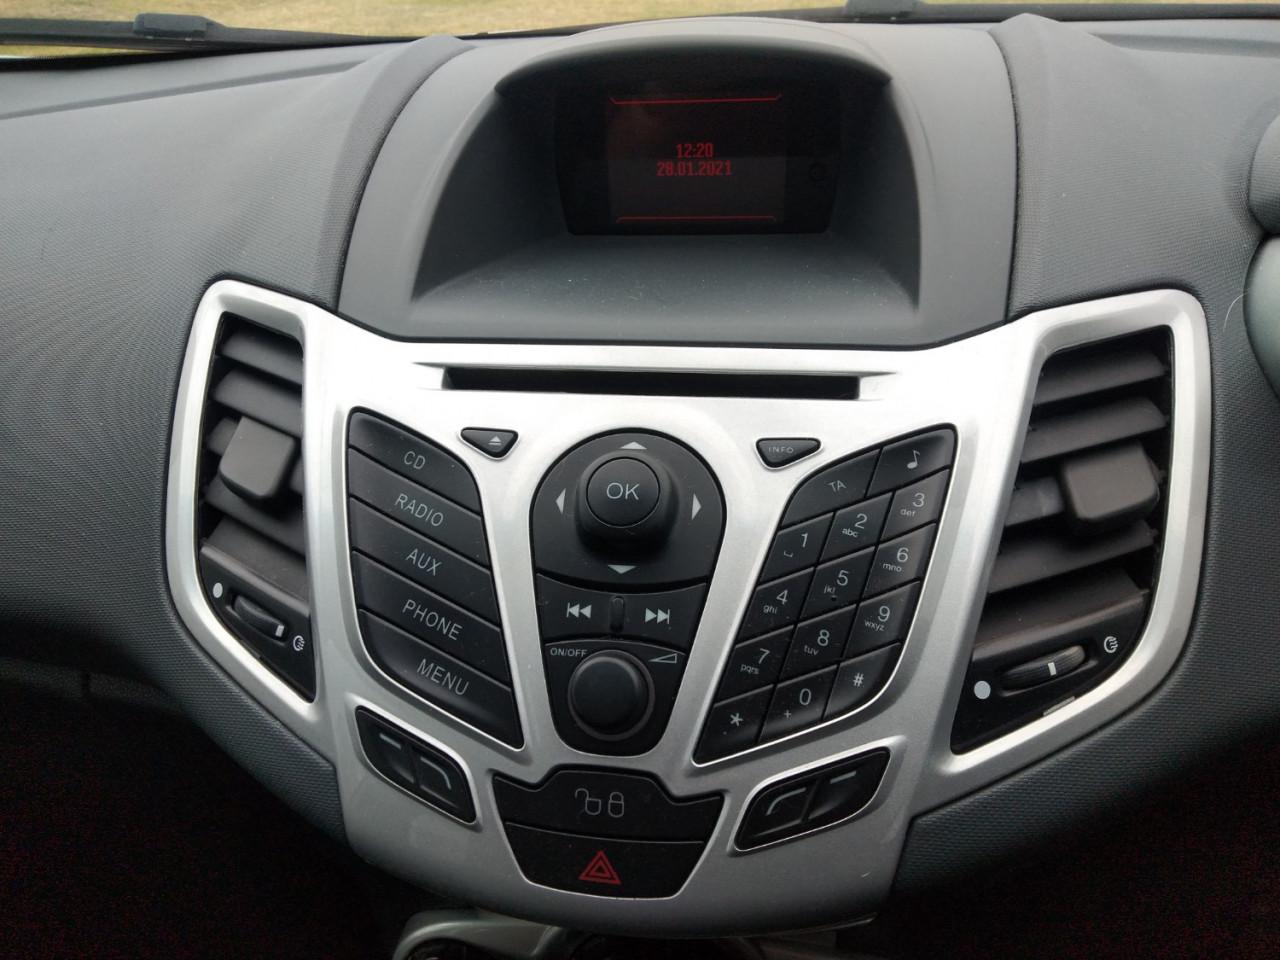 2012 Ford Fiesta WT LX Sedan Image 14